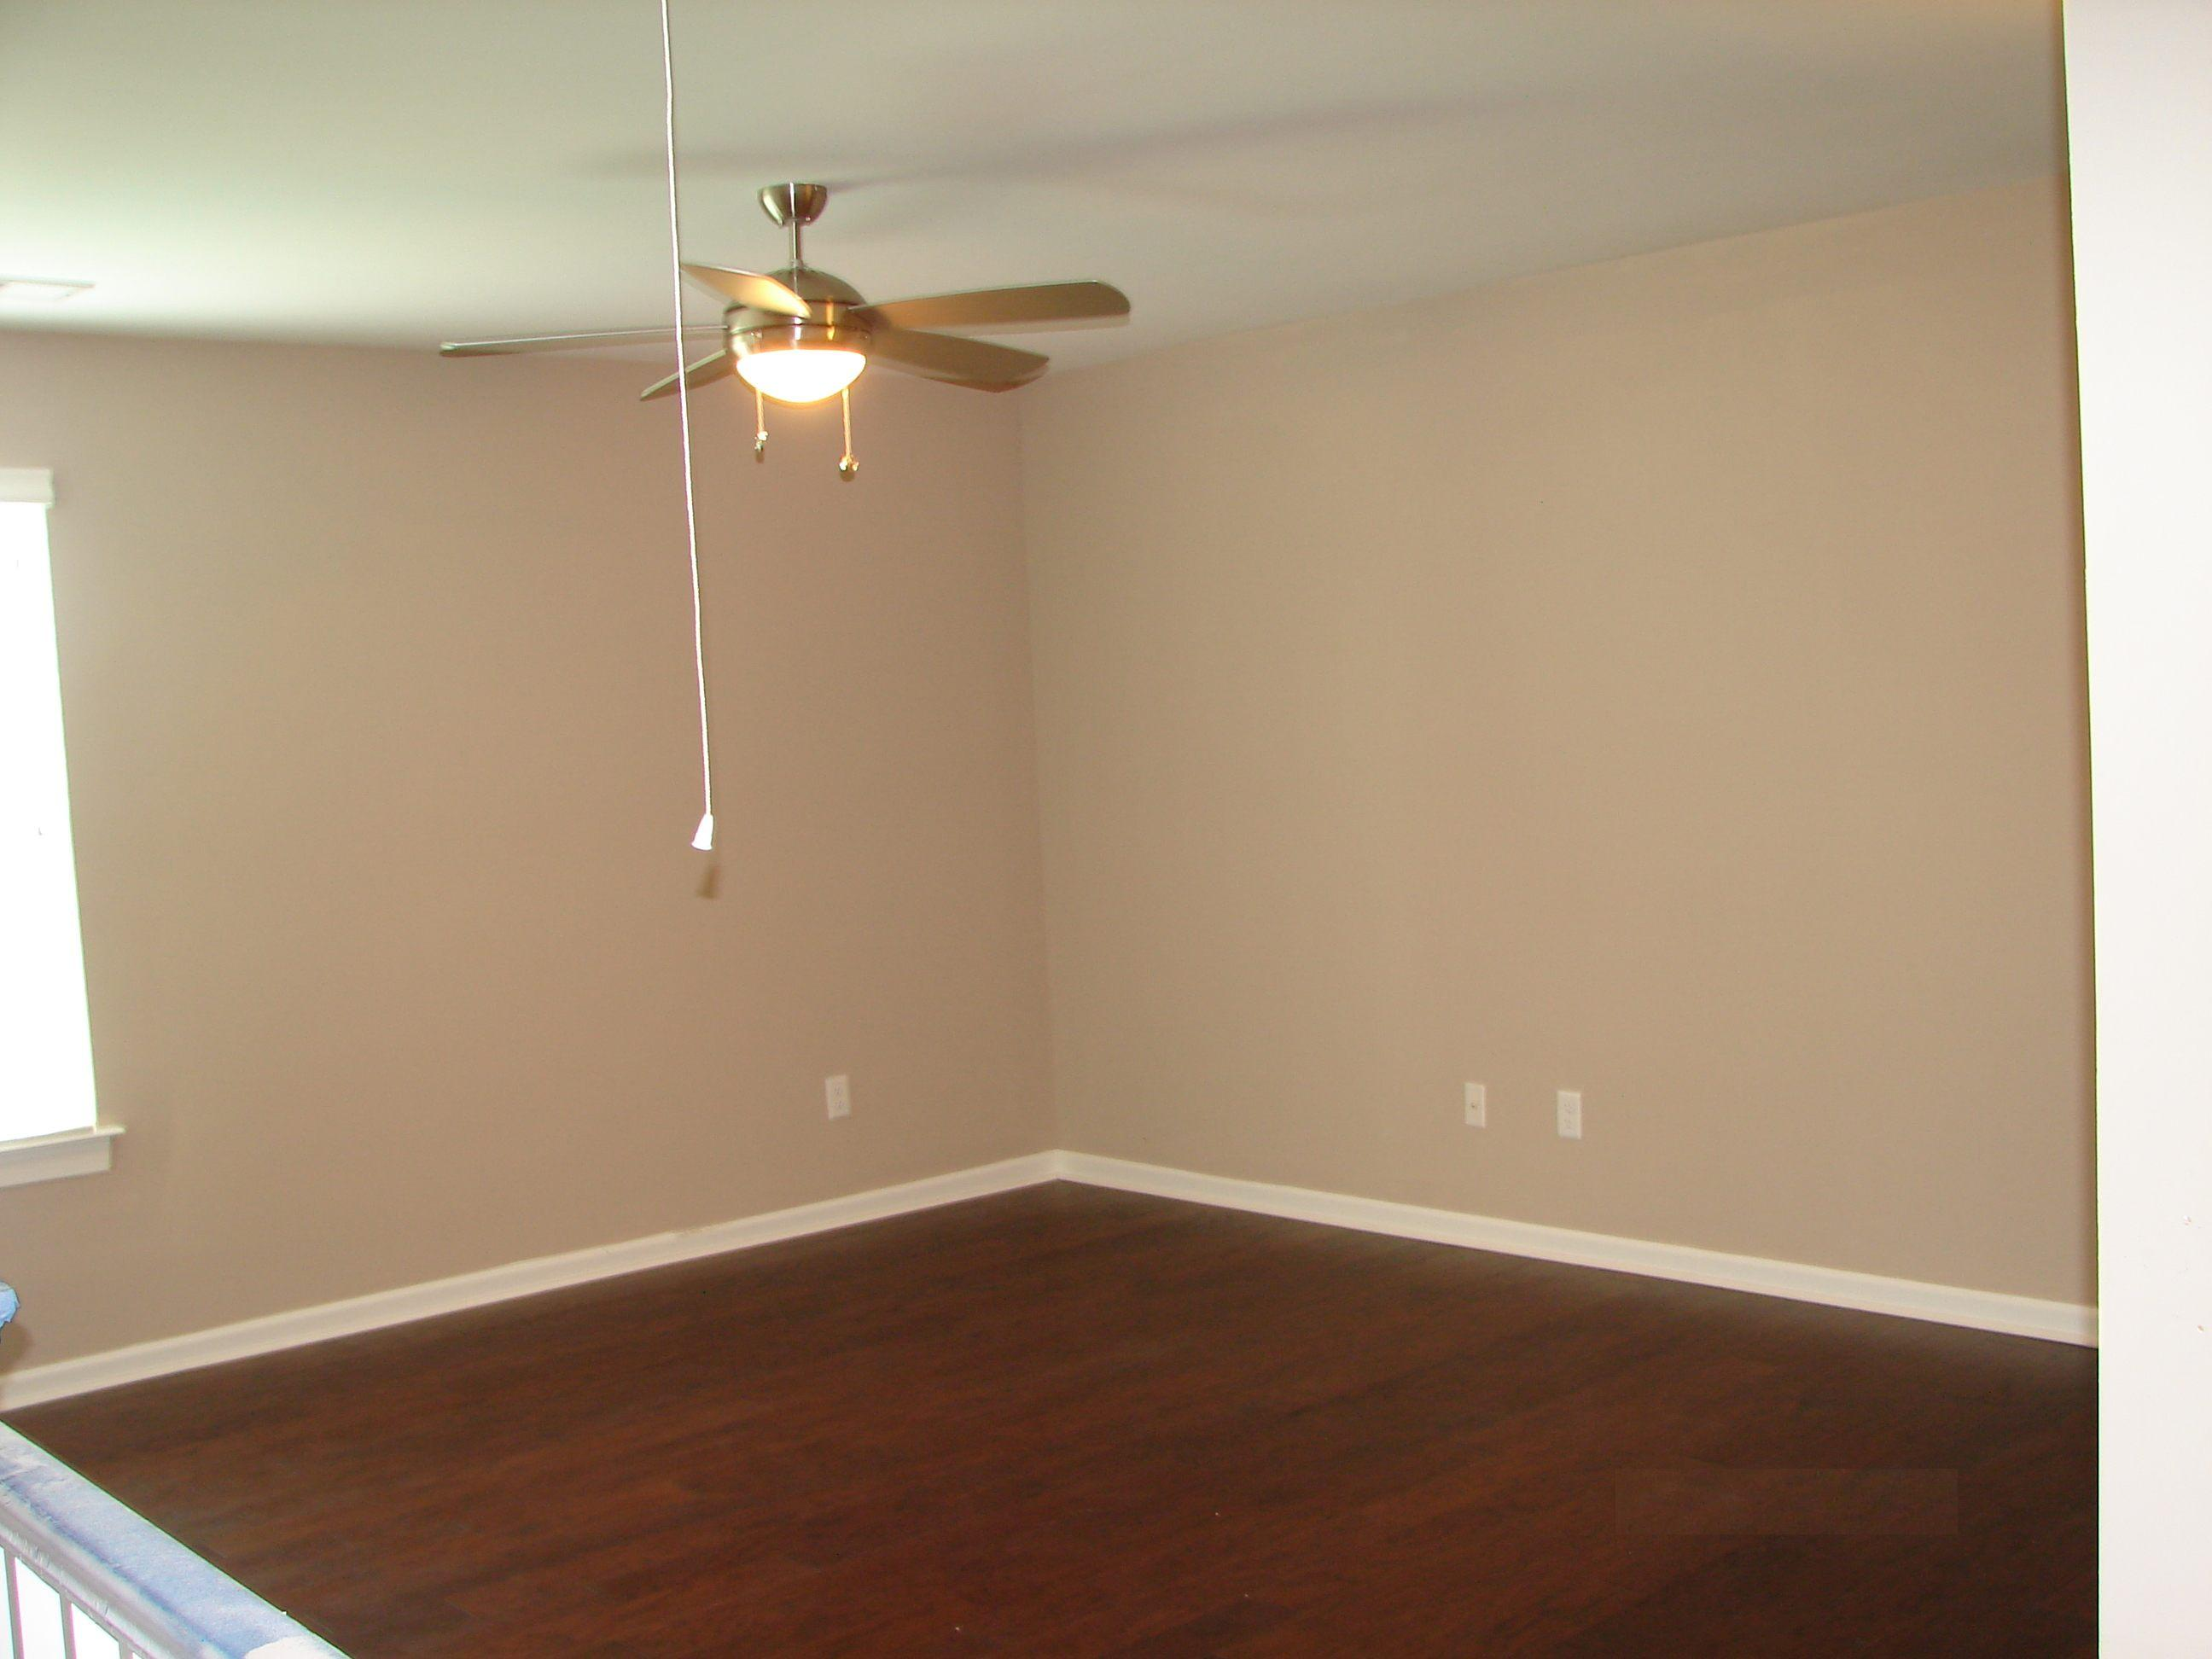 Filbin Creek Homes For Sale - 1173 Sumner, North Charleston, SC - 8